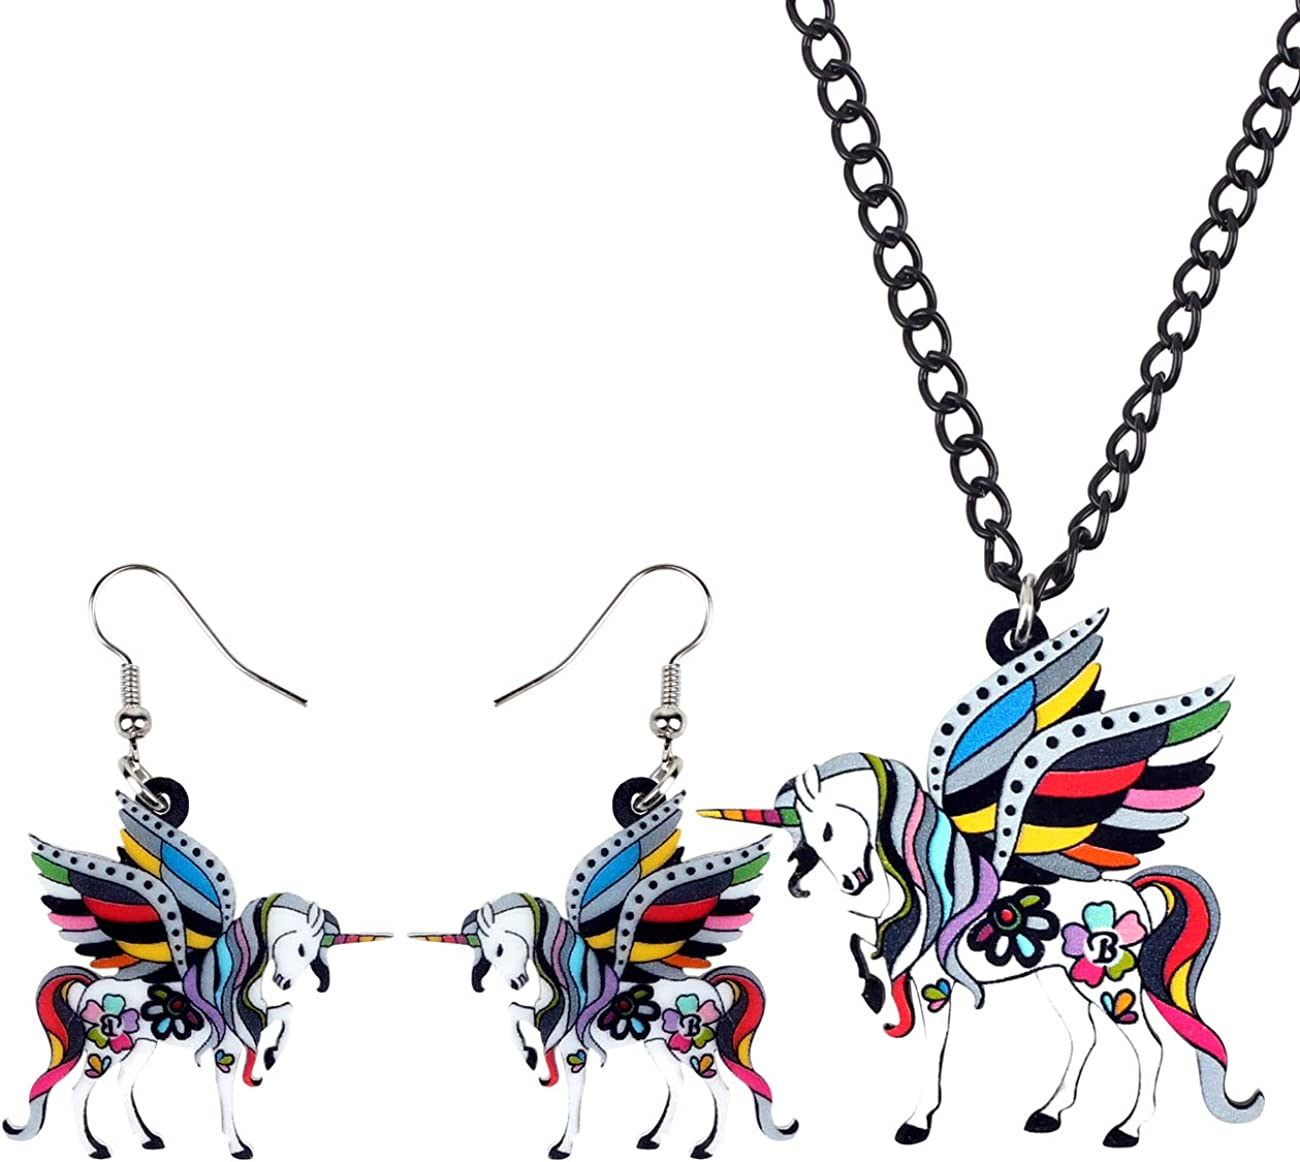 DUOWEI Phoenix Mall Acrylic Floral Flying Popularity Horse Earrings Jewelry Unicorn Sets